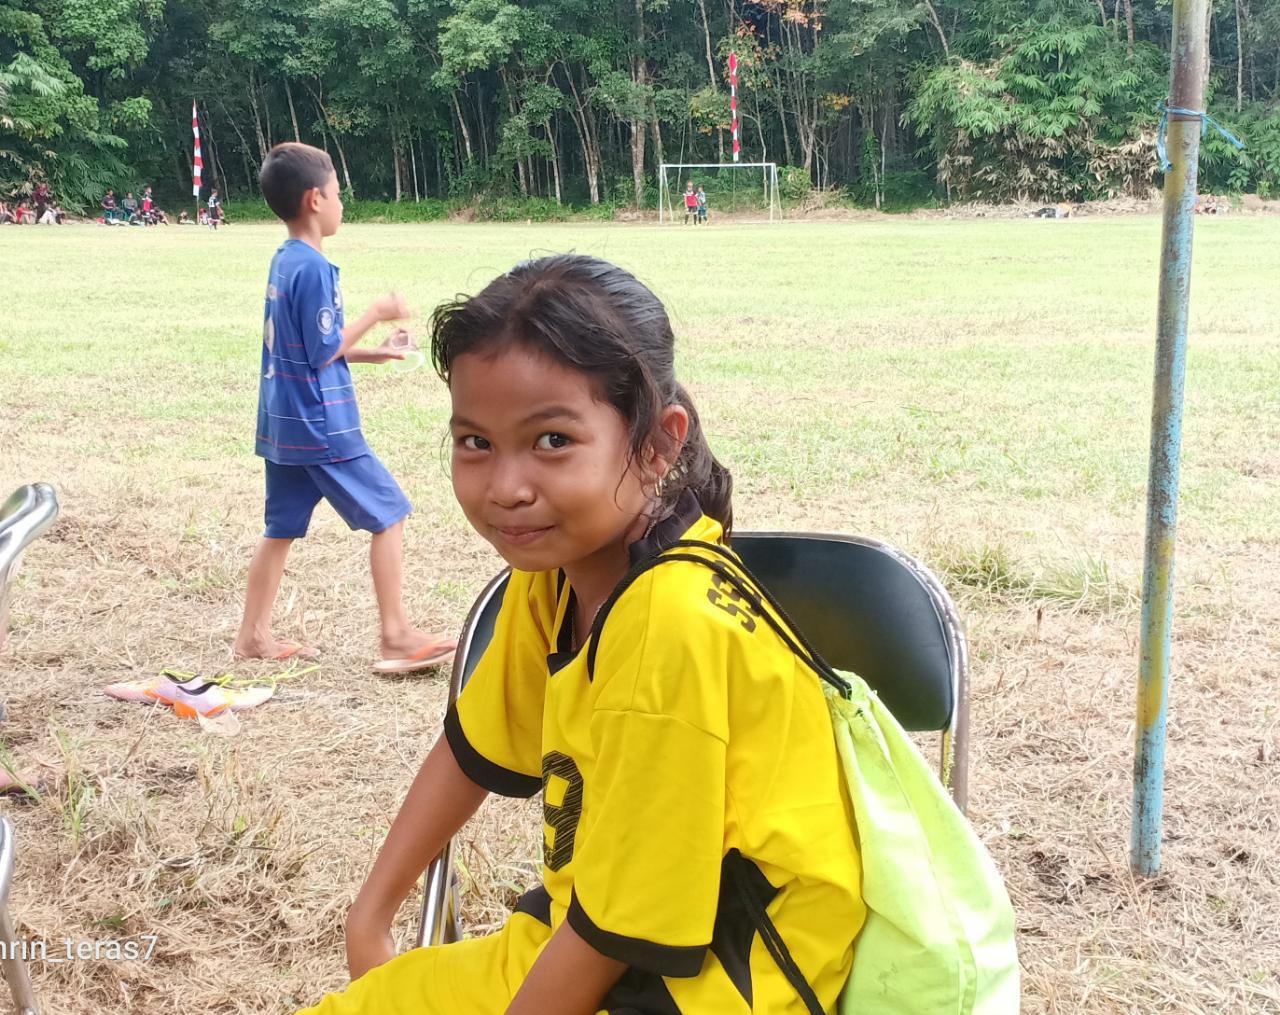 Menarik, Anak Perempuan Ikut Camat Cup U-12 Balangan 6